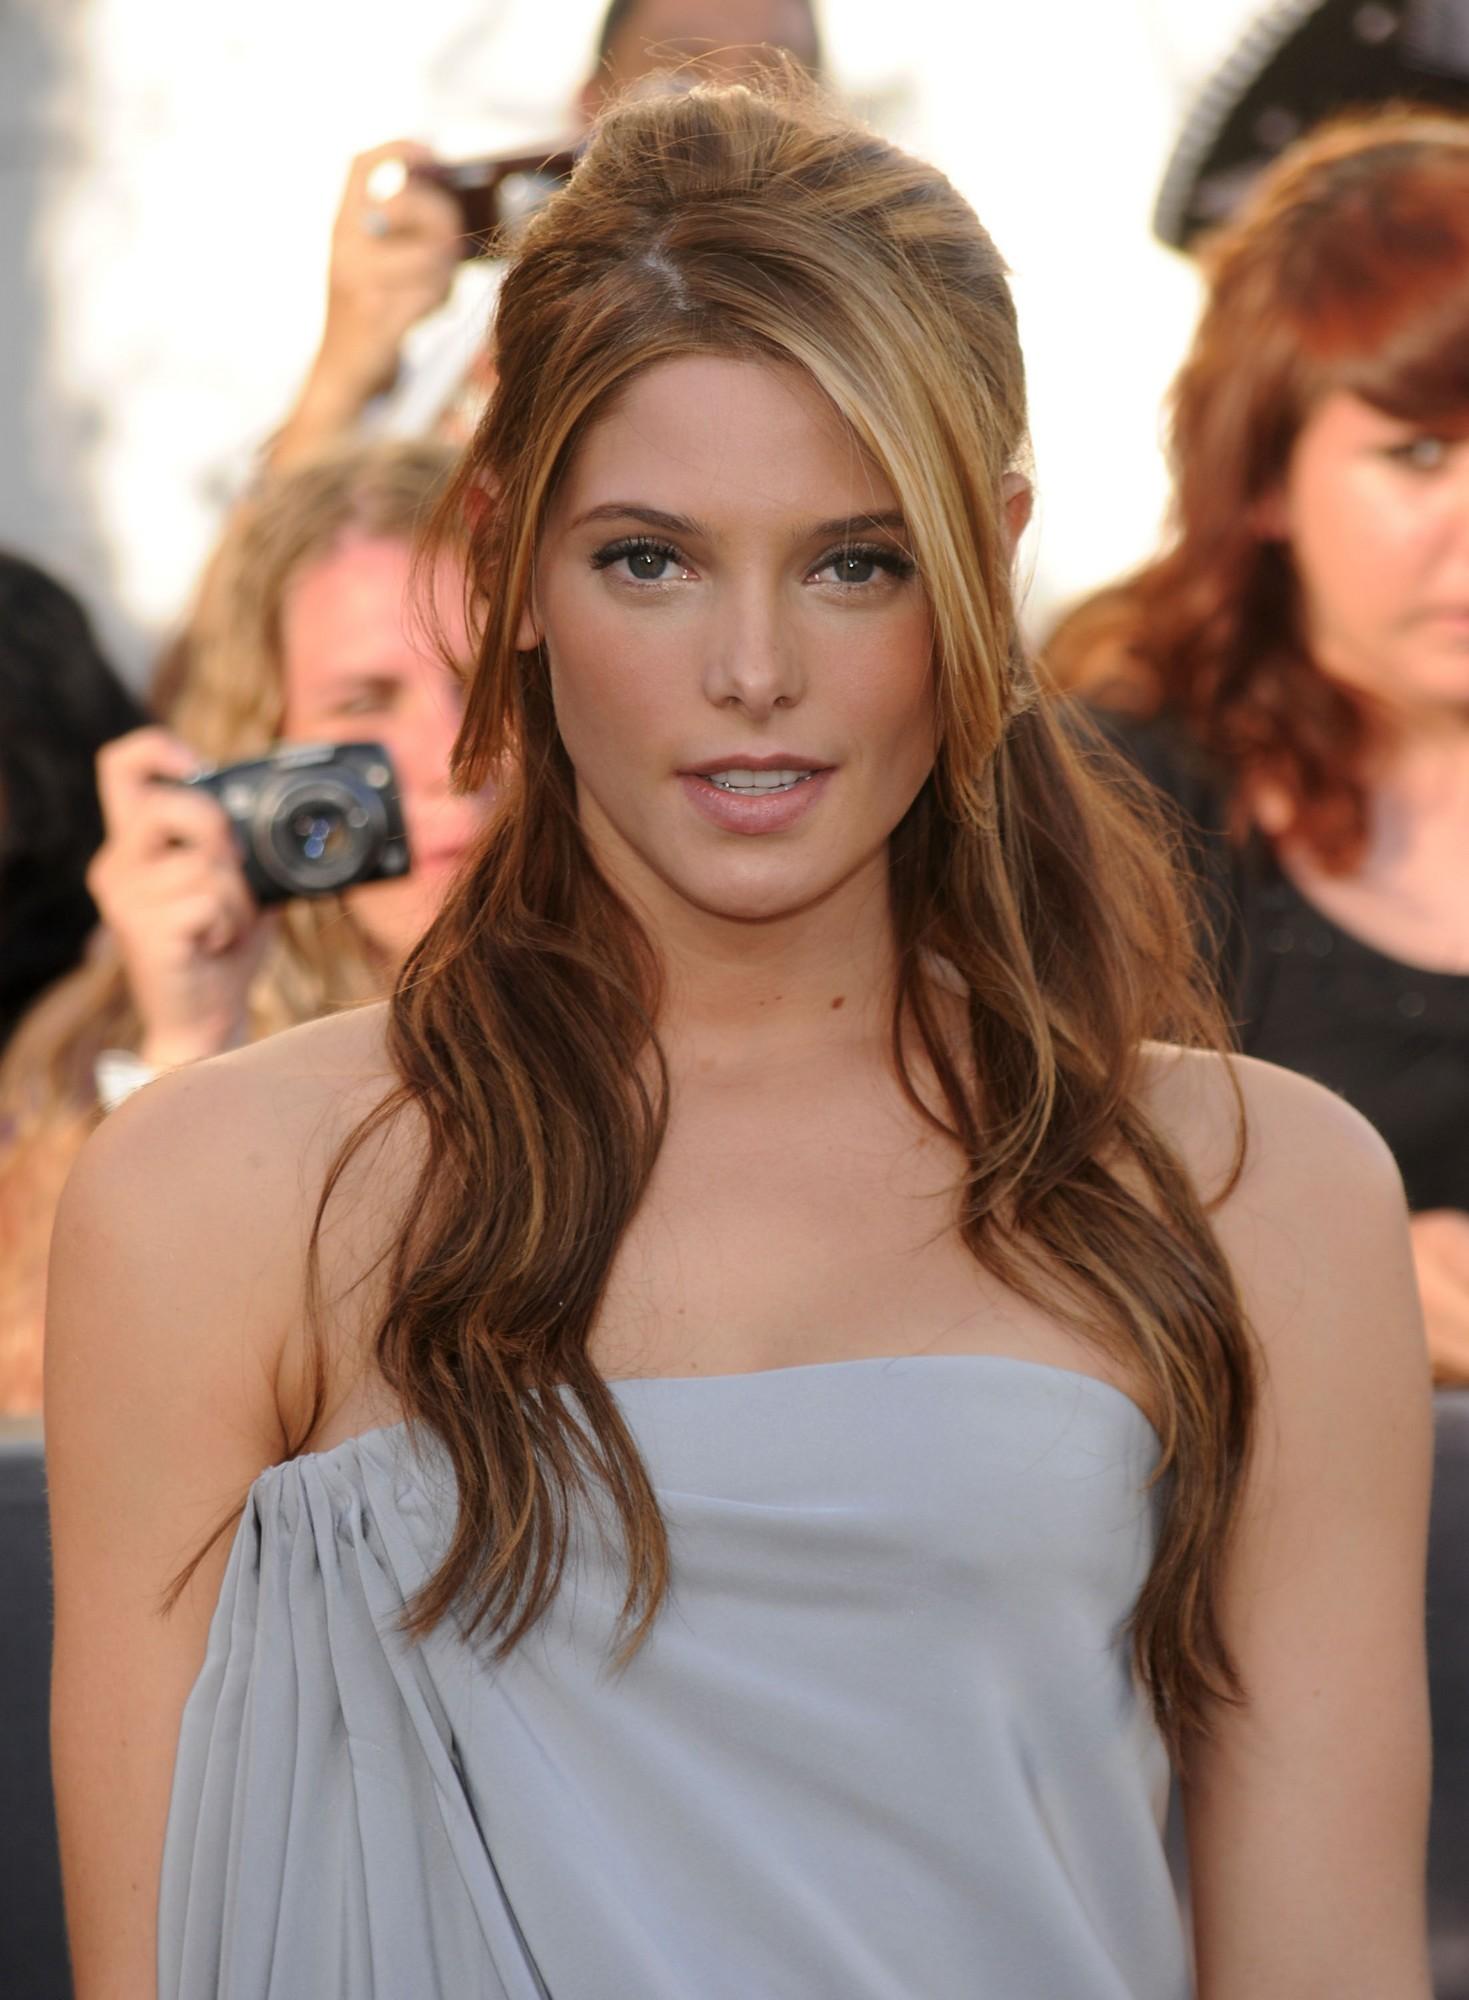 Photos of celebrity hairstyles Short Hairstyles Lookbook - StyleBistro